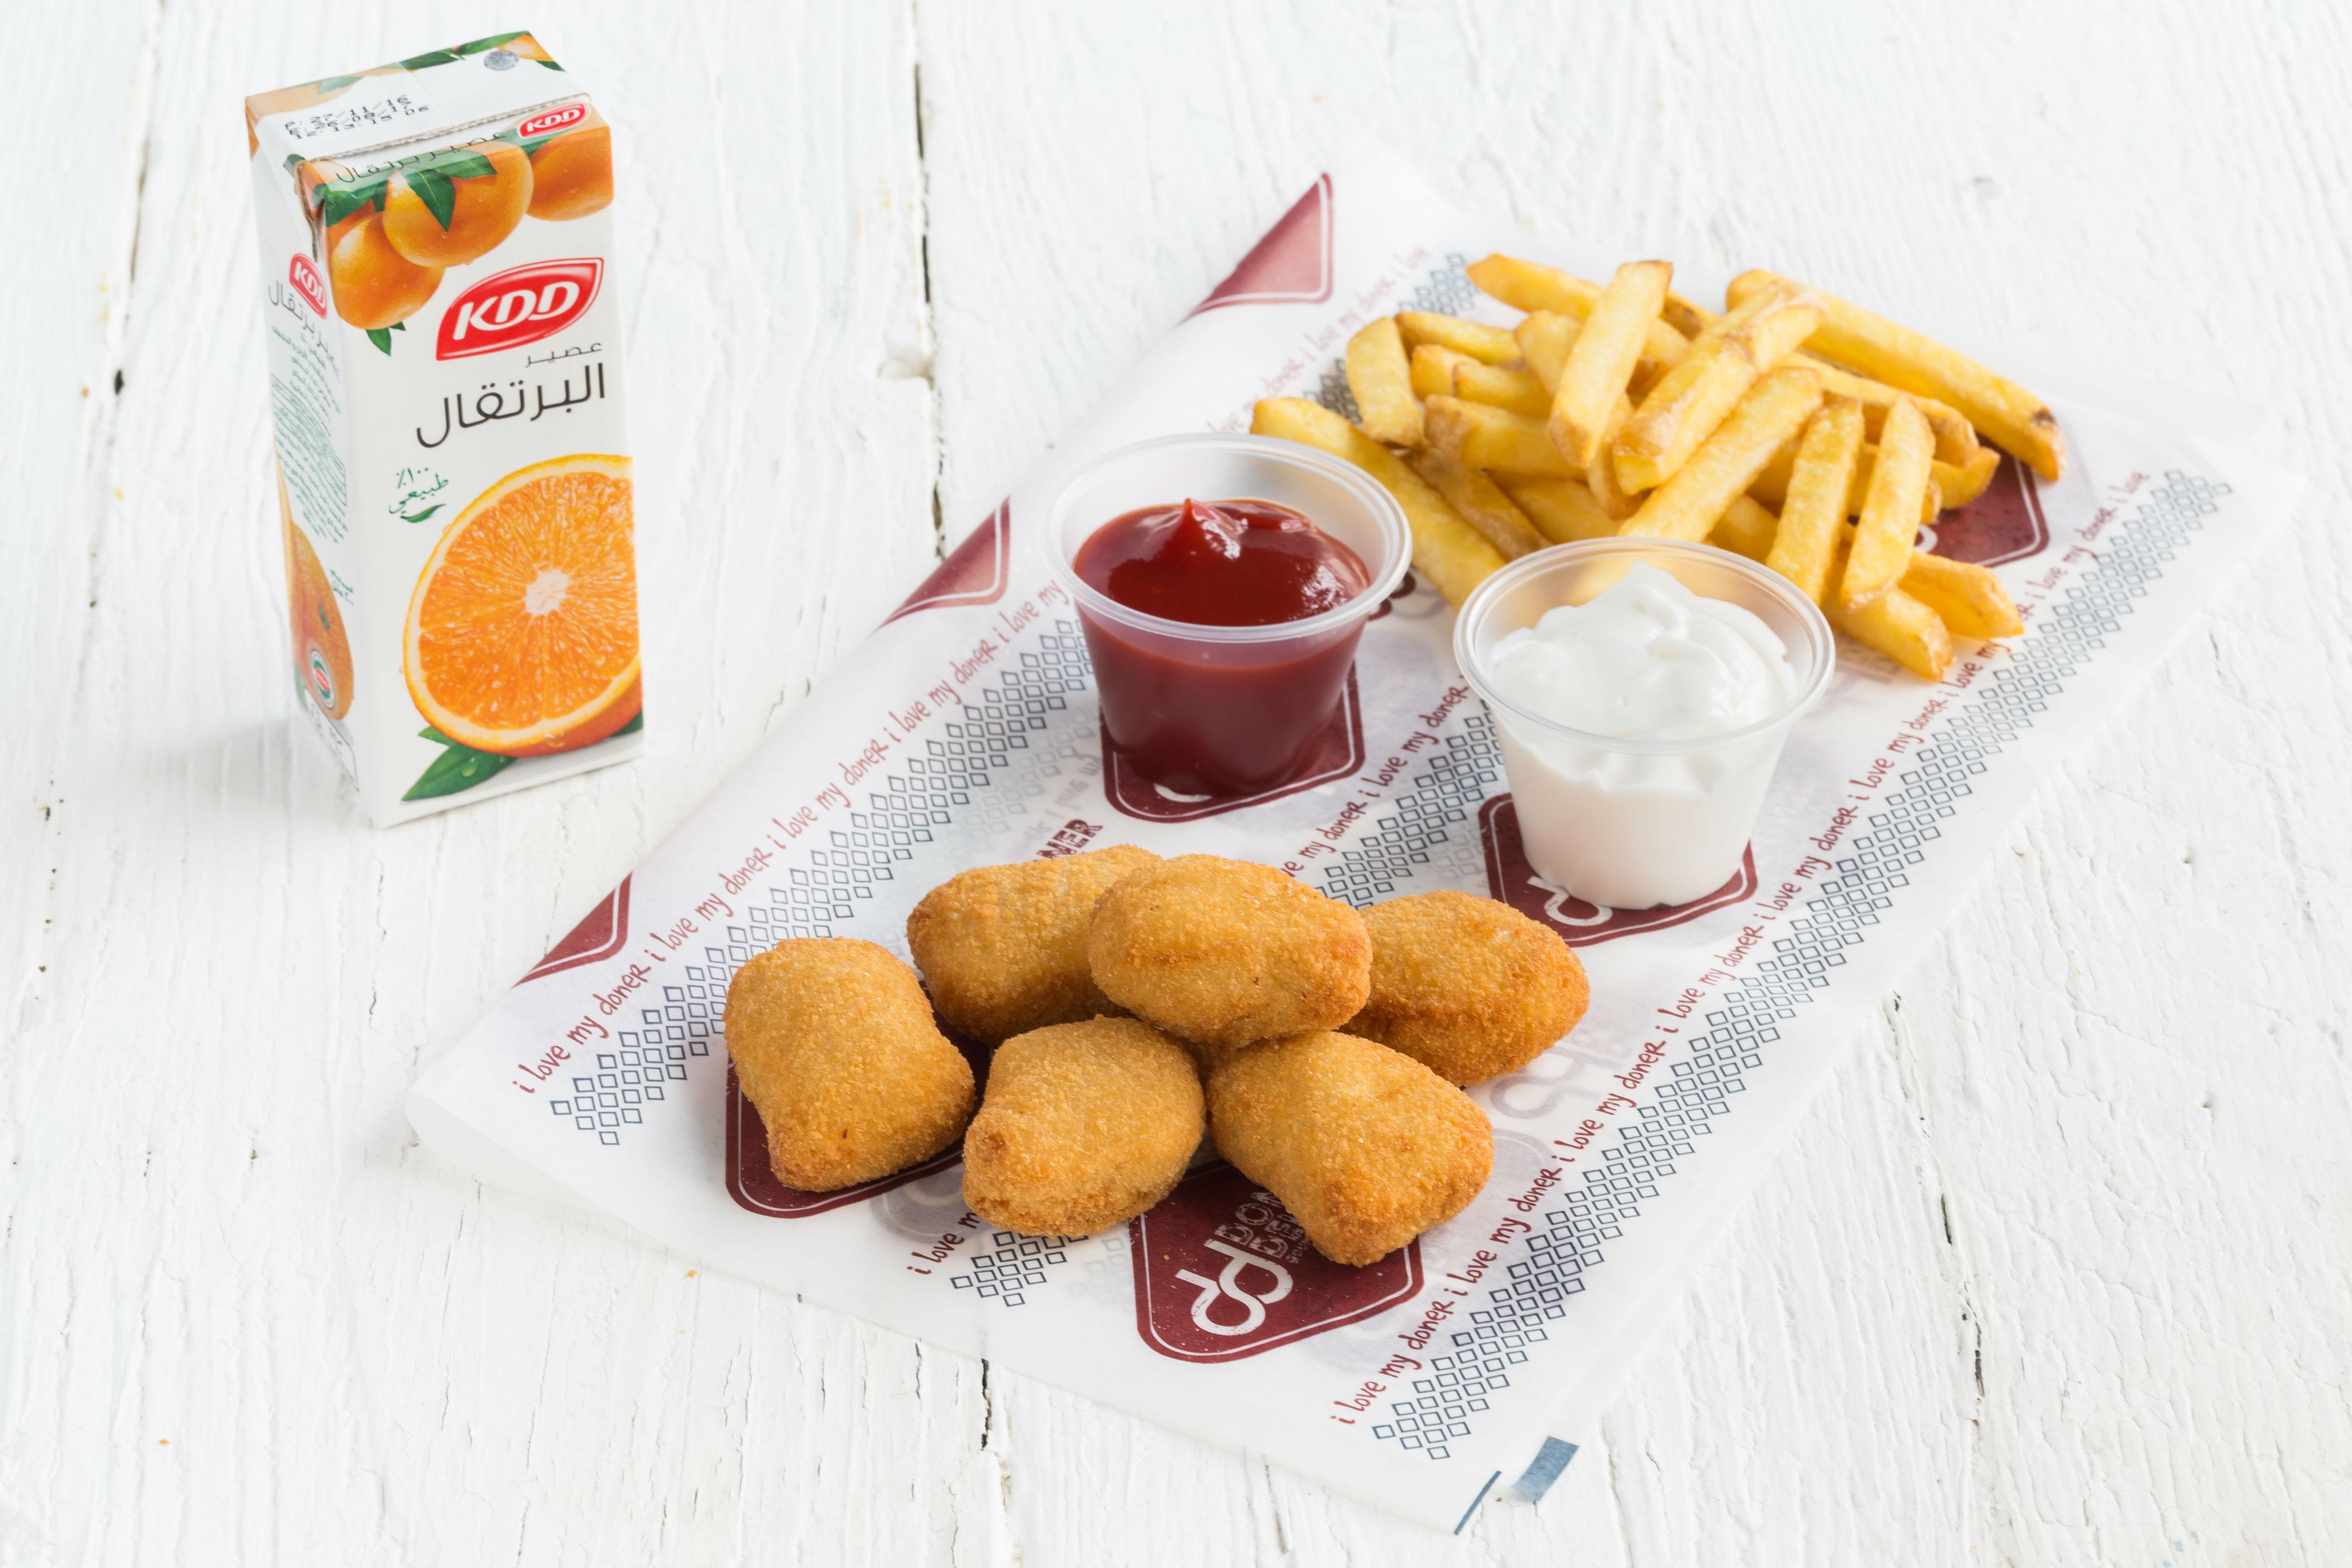 Kids Nuggets Meal (6 Pcs)